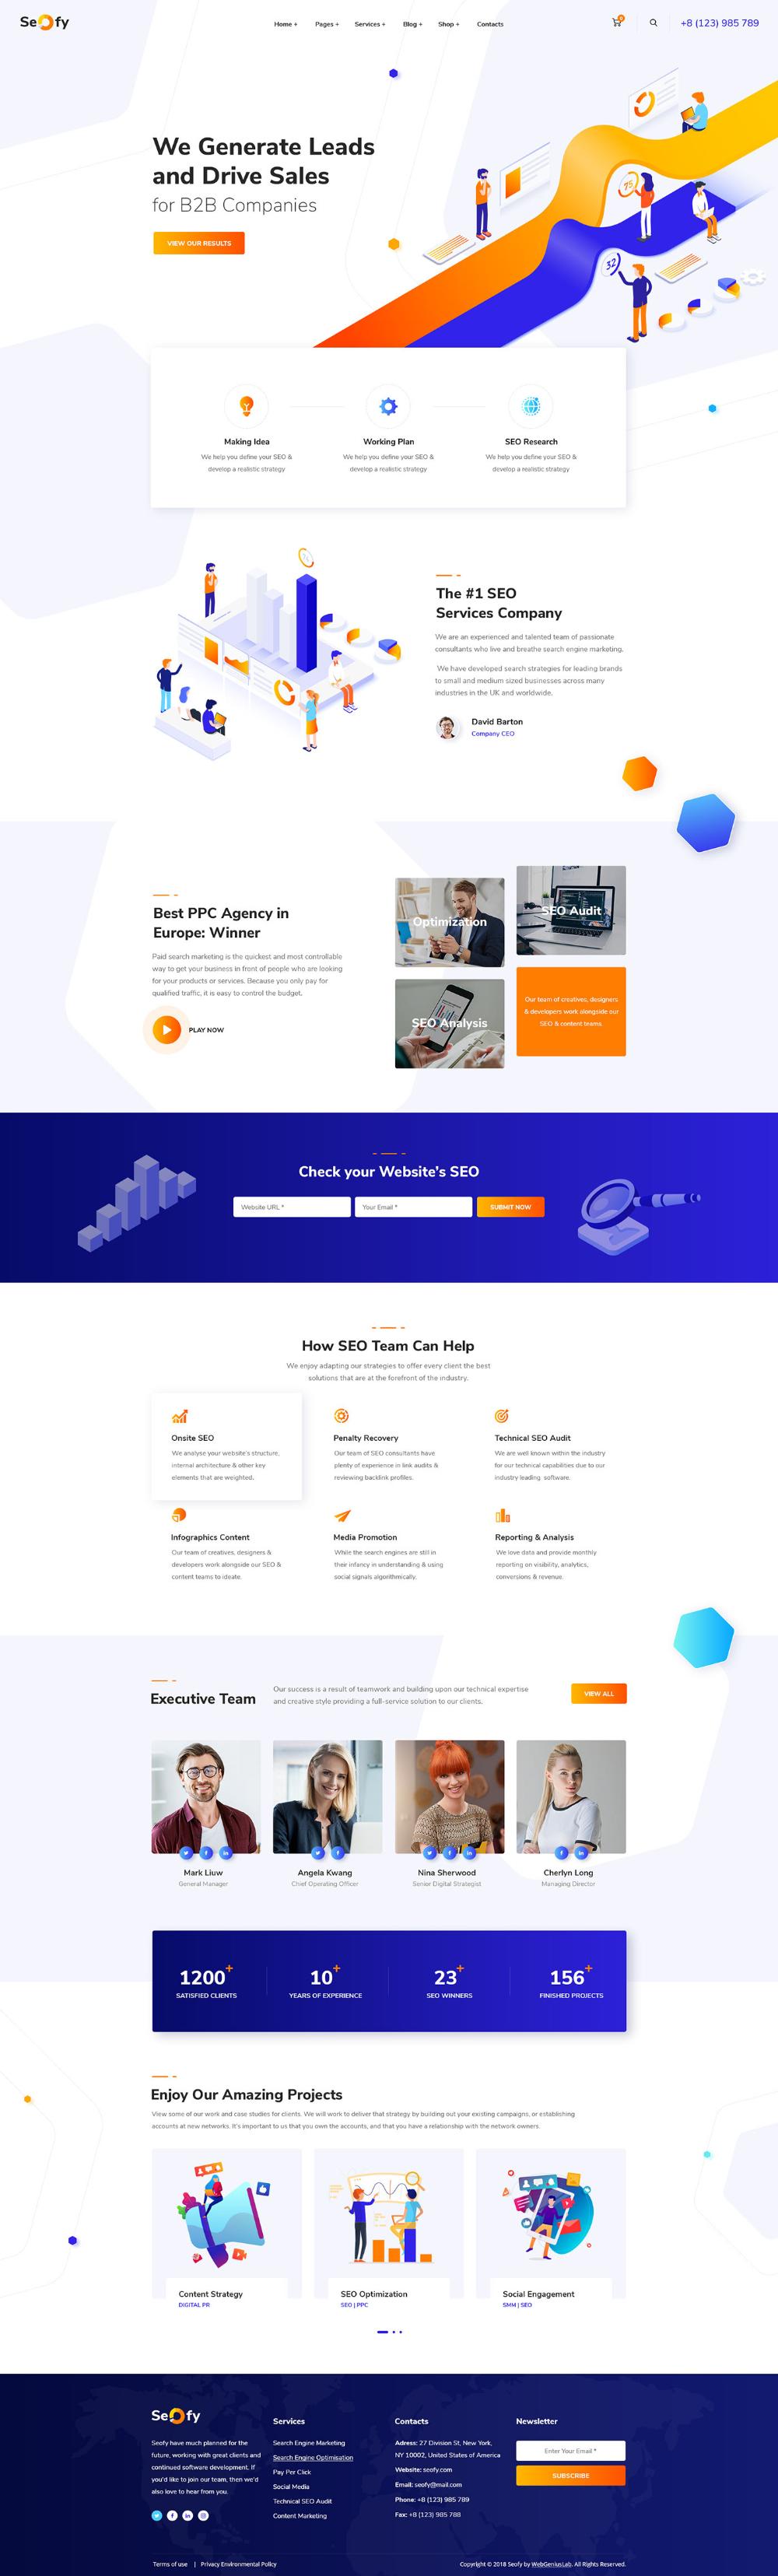 Seofy B2b Website On Behance Seo Digital Marketing Digital Marketing Agency B2b Website